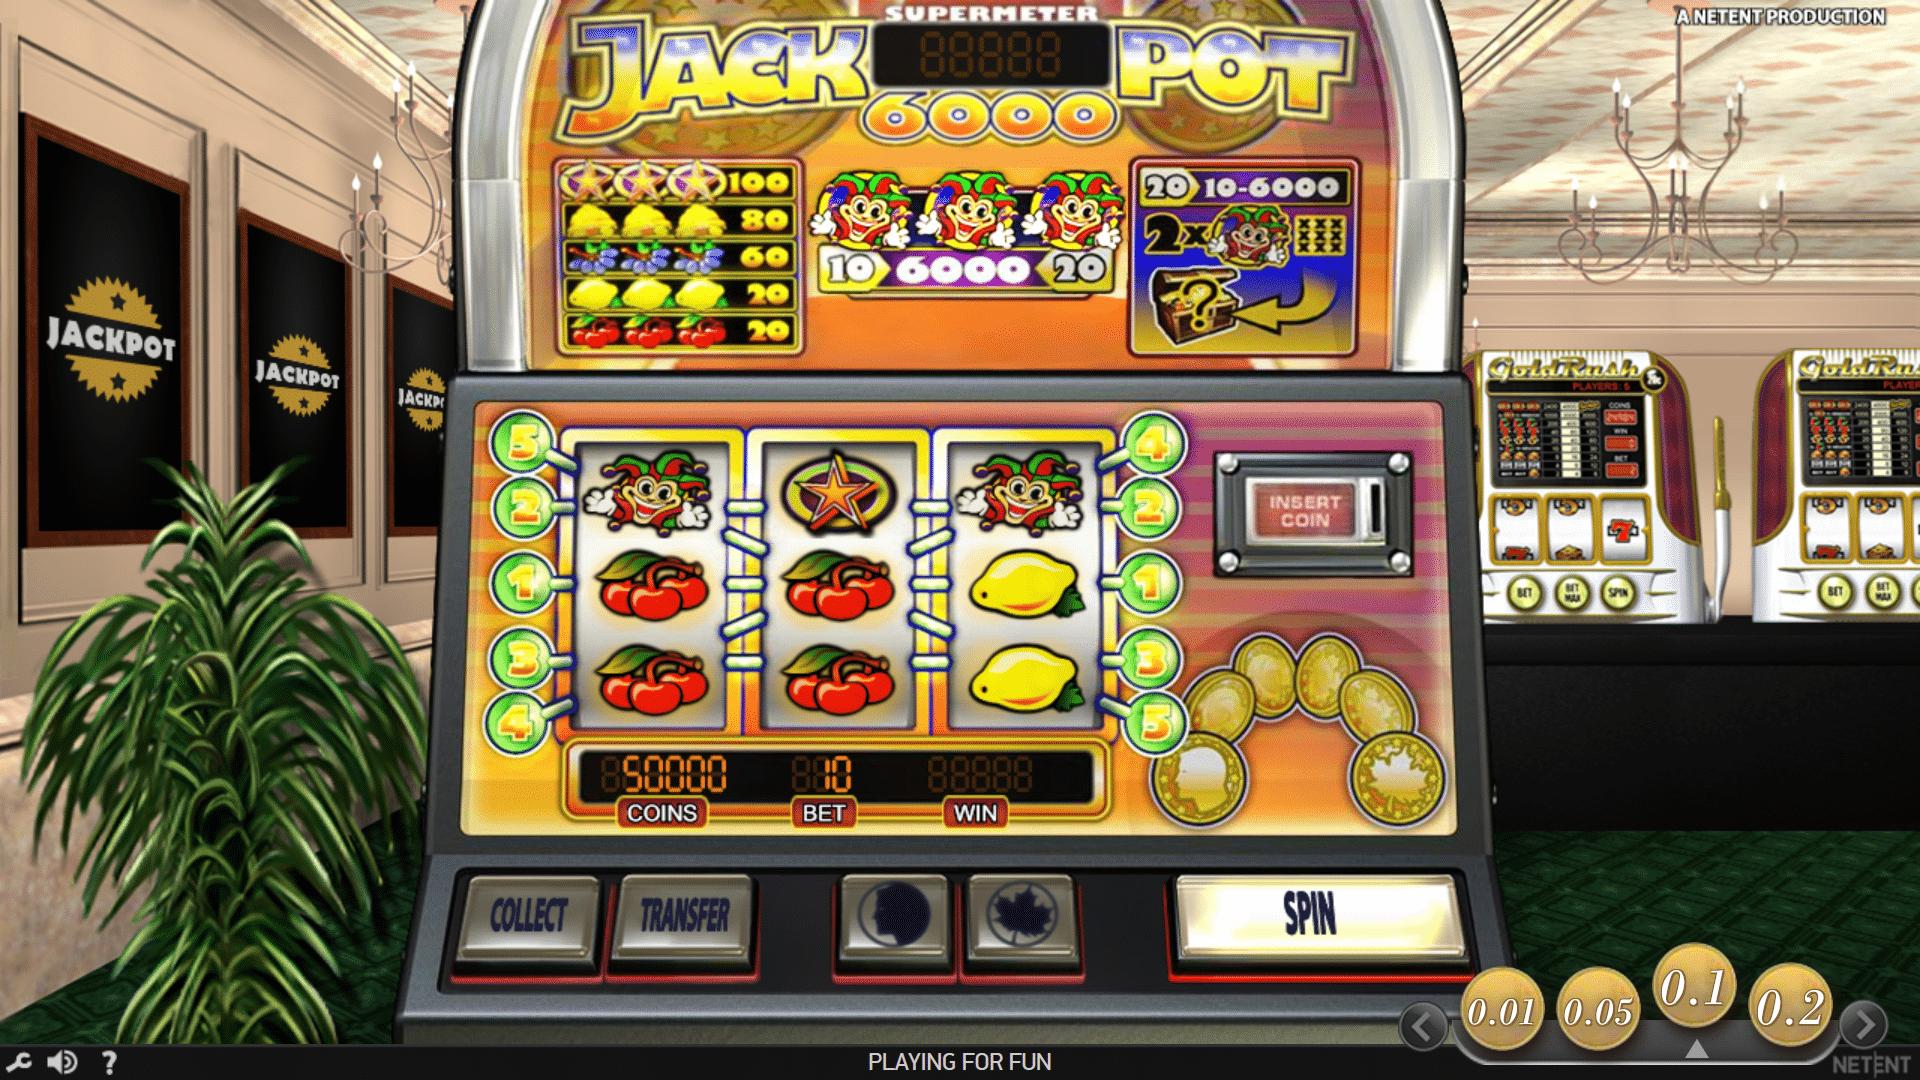 Slot Jackpot 6000